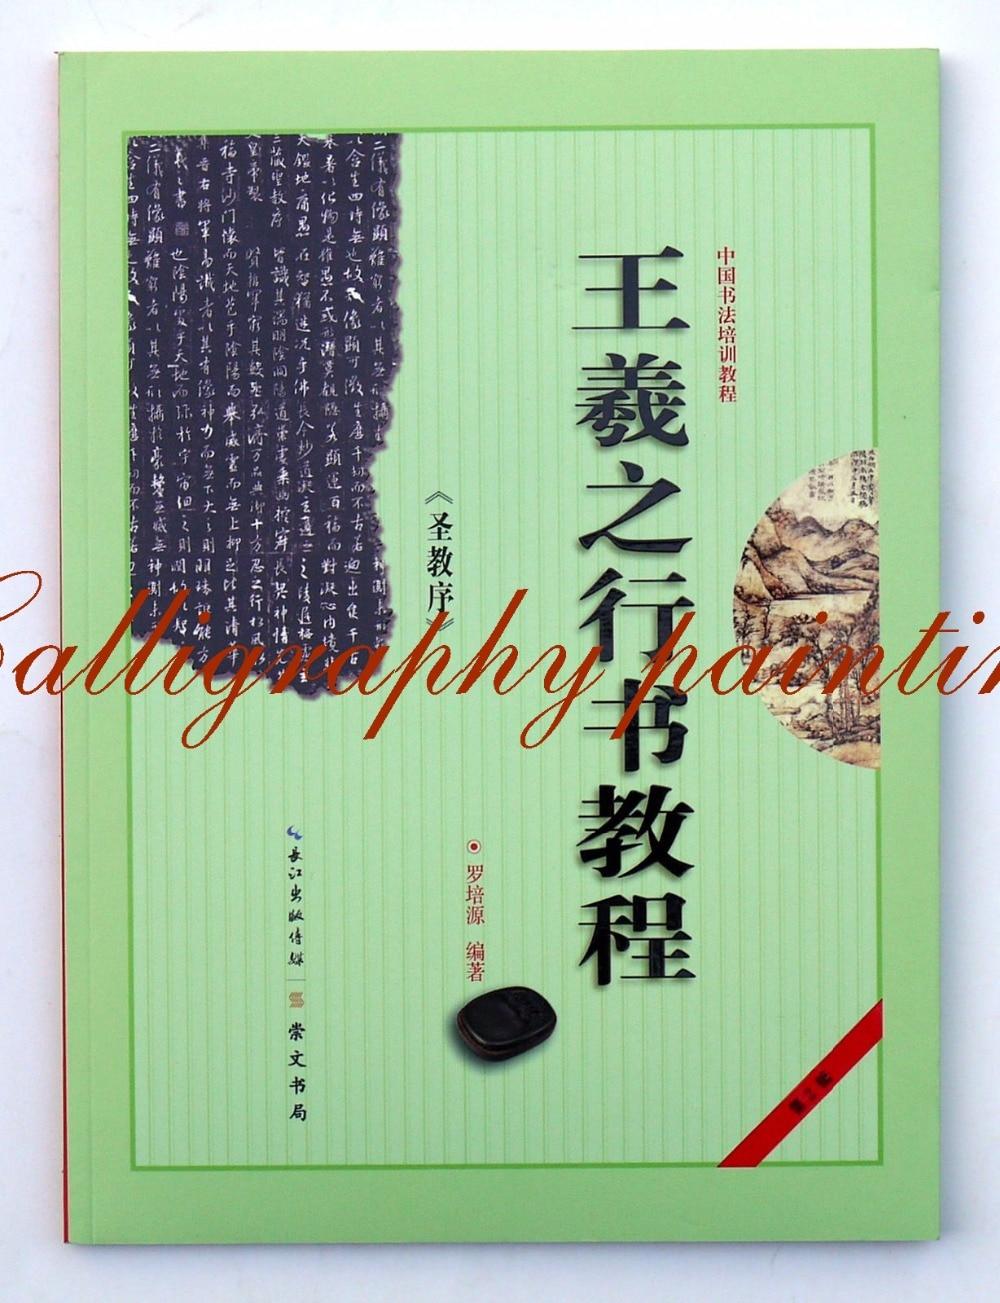 цены Chinese calligraphy Kaishu course book Yan Zhenqin Qin Li Bei Calligraphy copybook